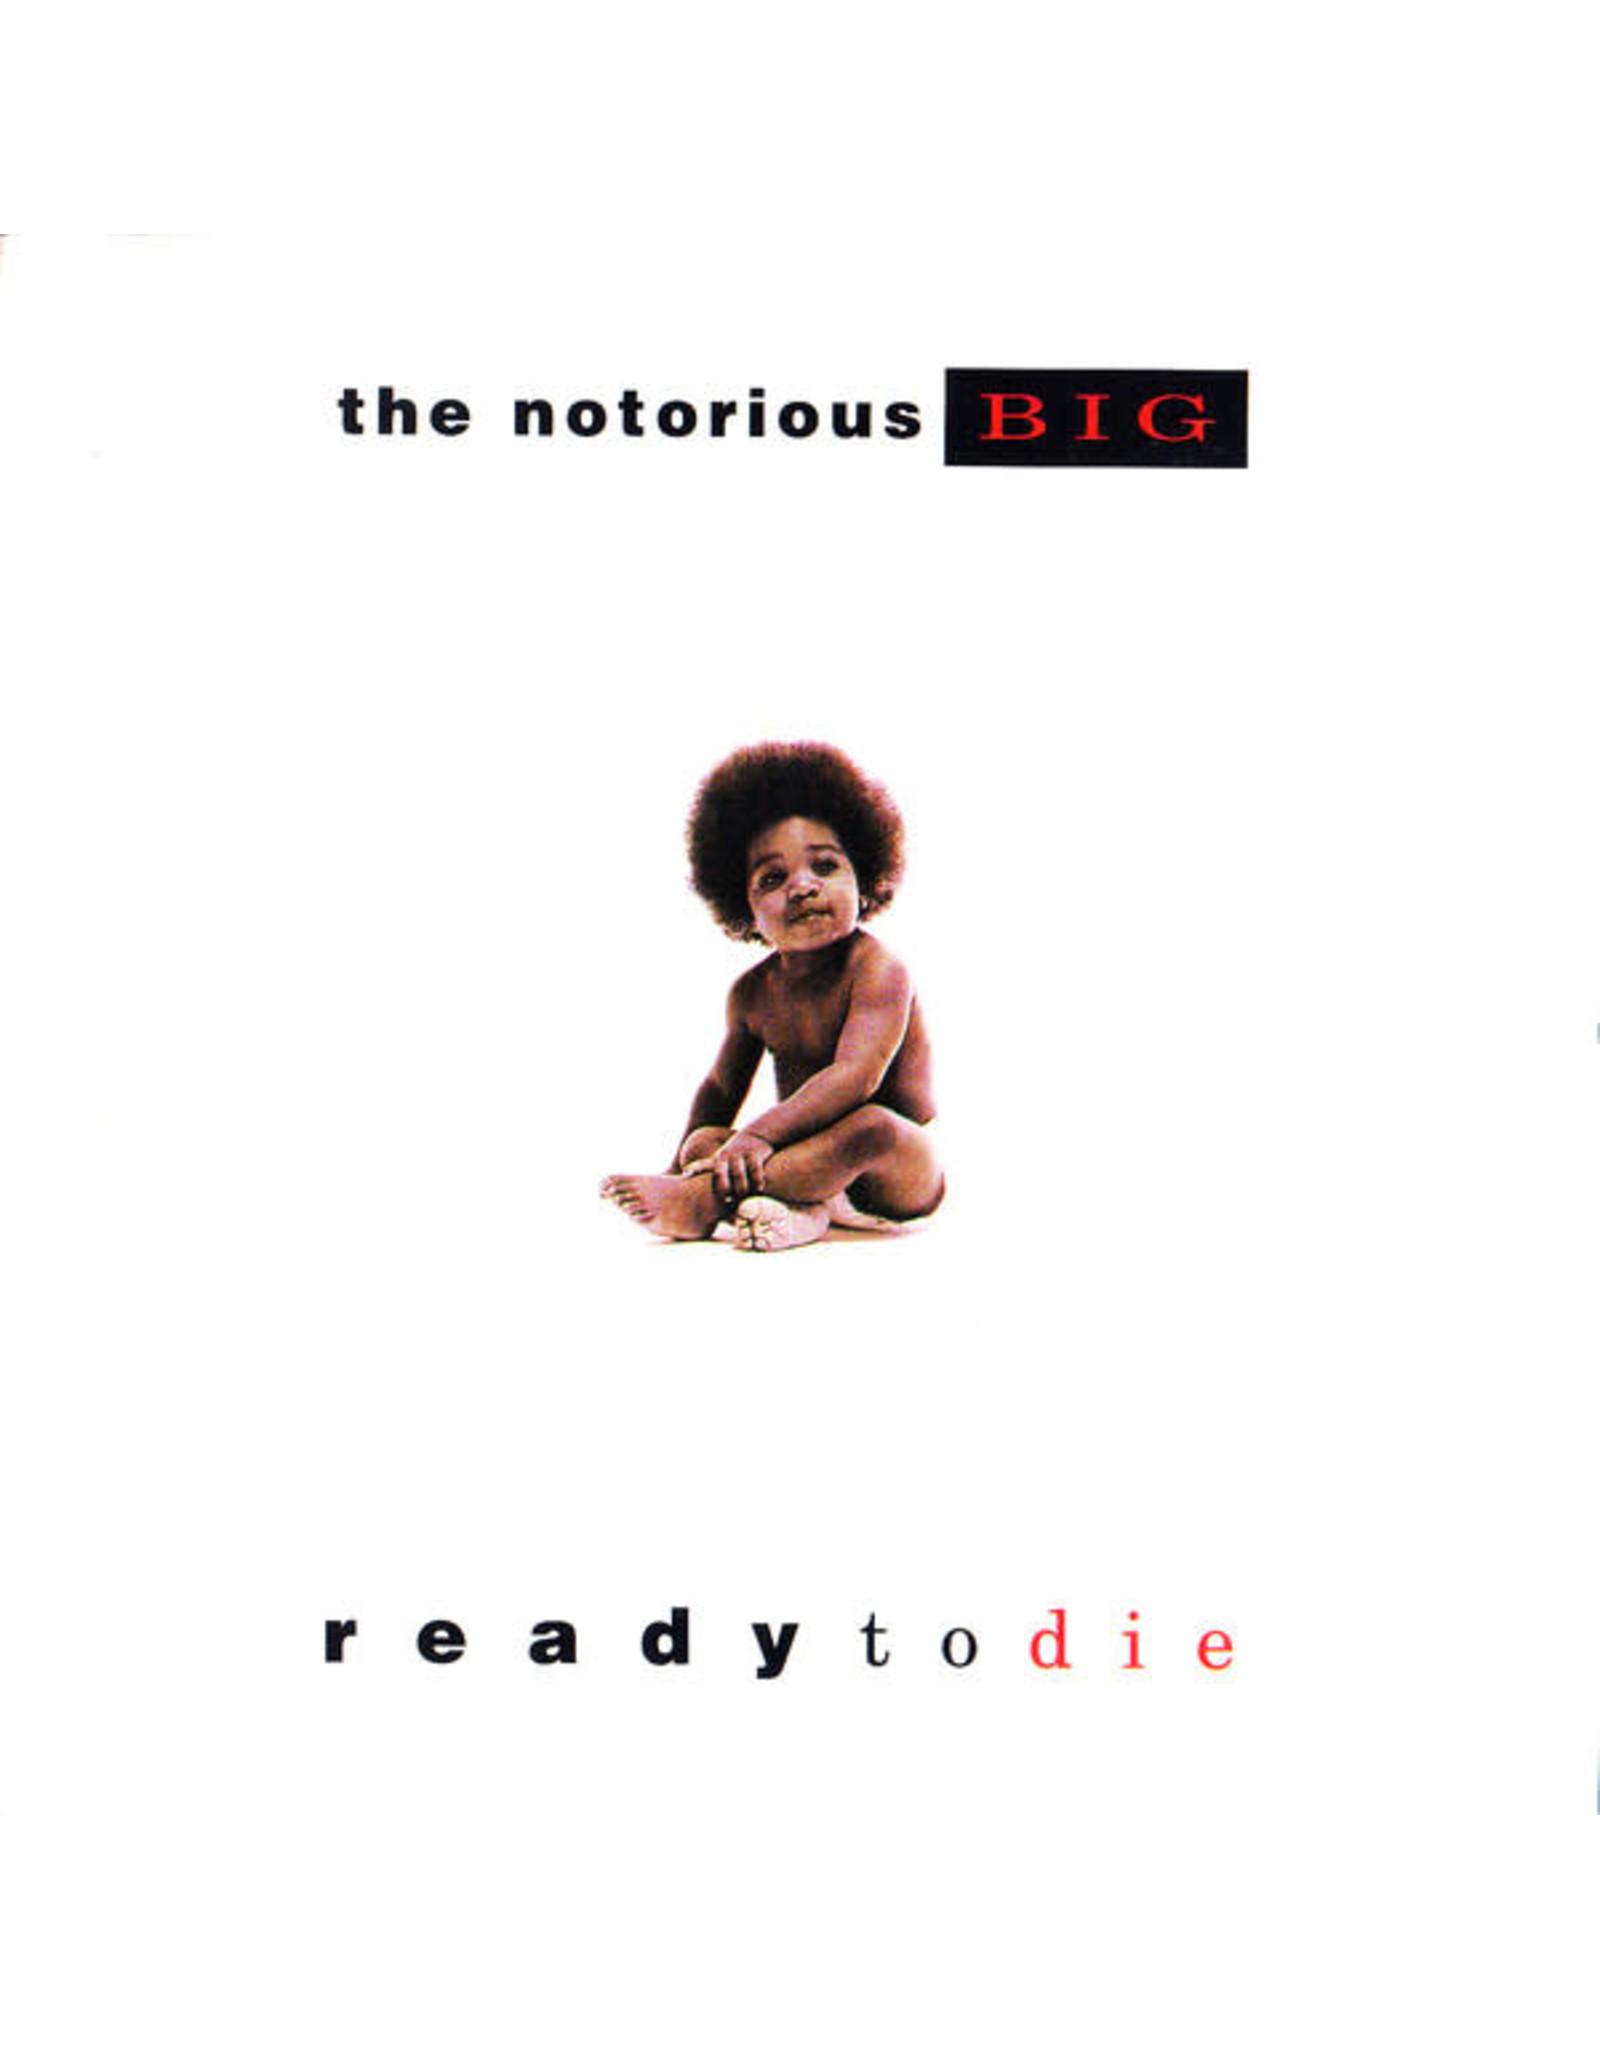 New Vinyl Notorious B.I.G. - Ready To Die 2LP